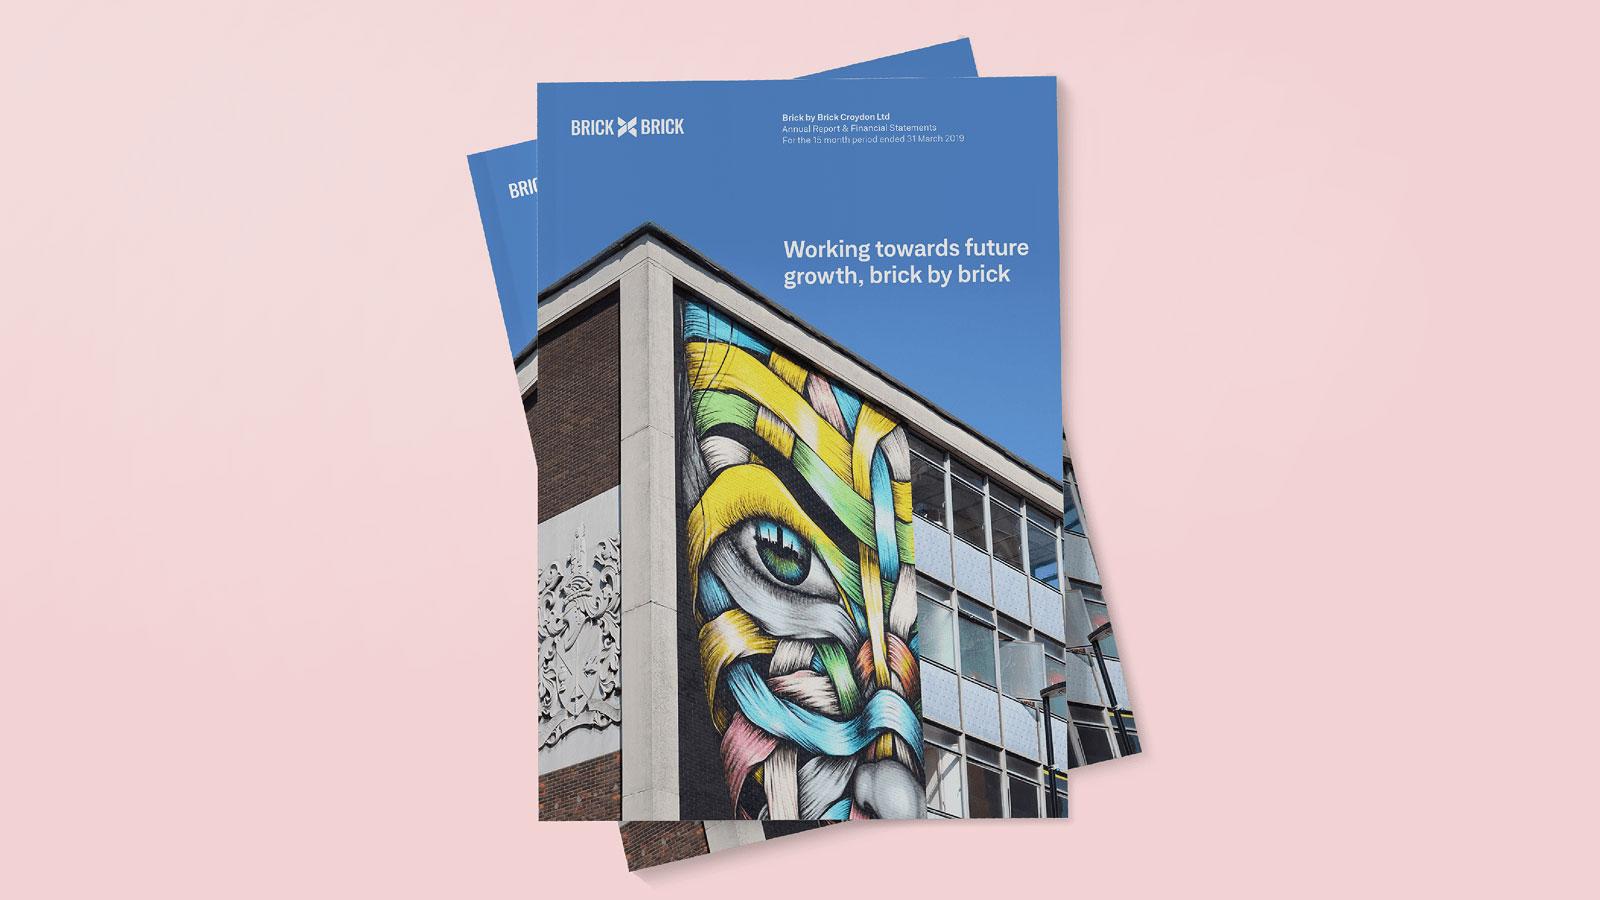 annual-report-financial-review-design-brochure-artwork-layout-milton-keynes-london-8